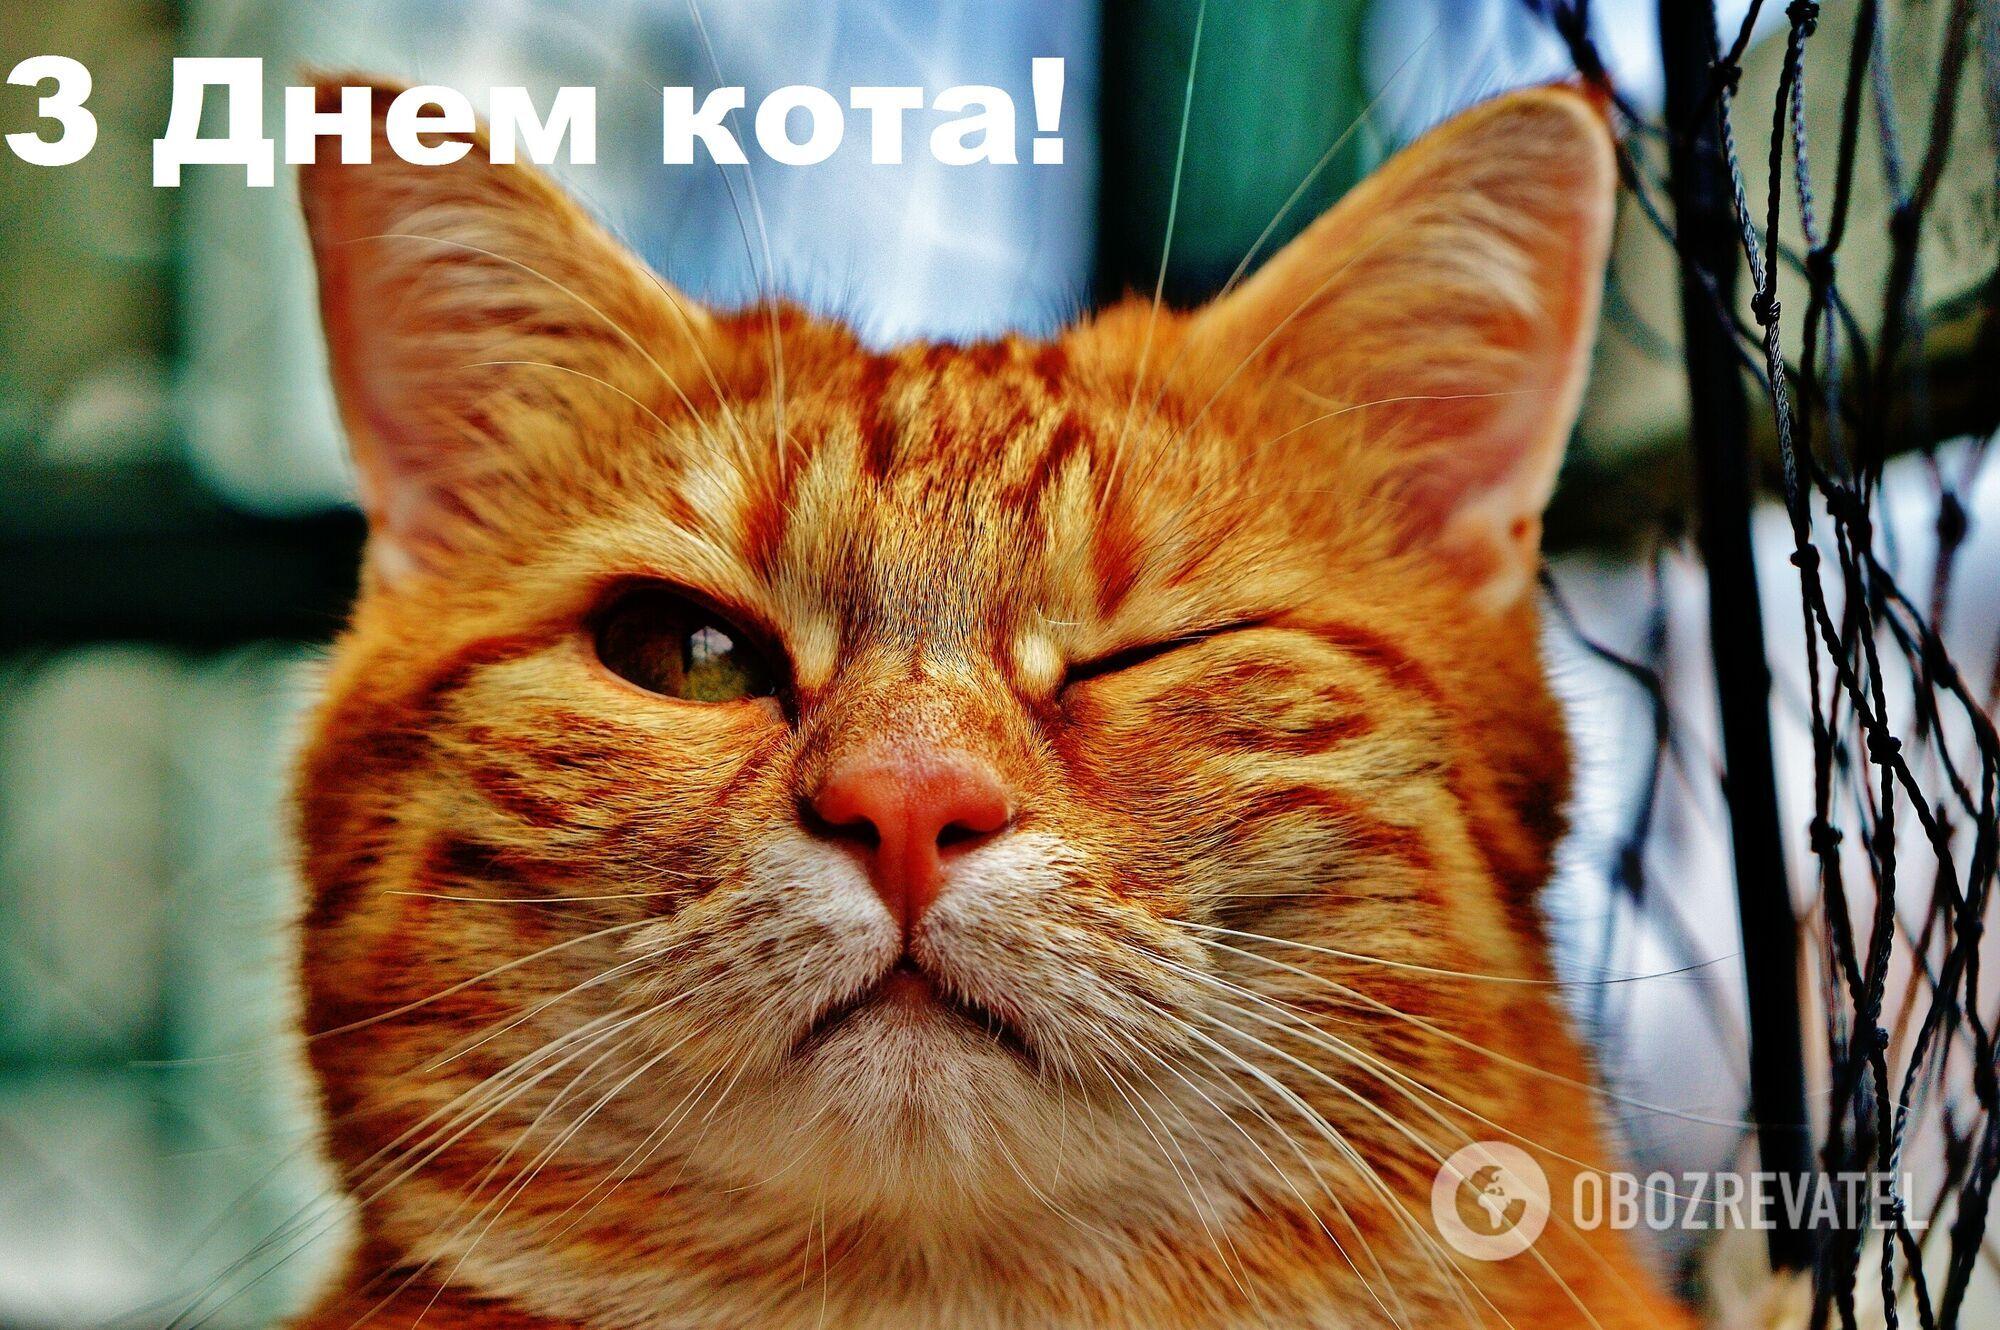 З Днем кота